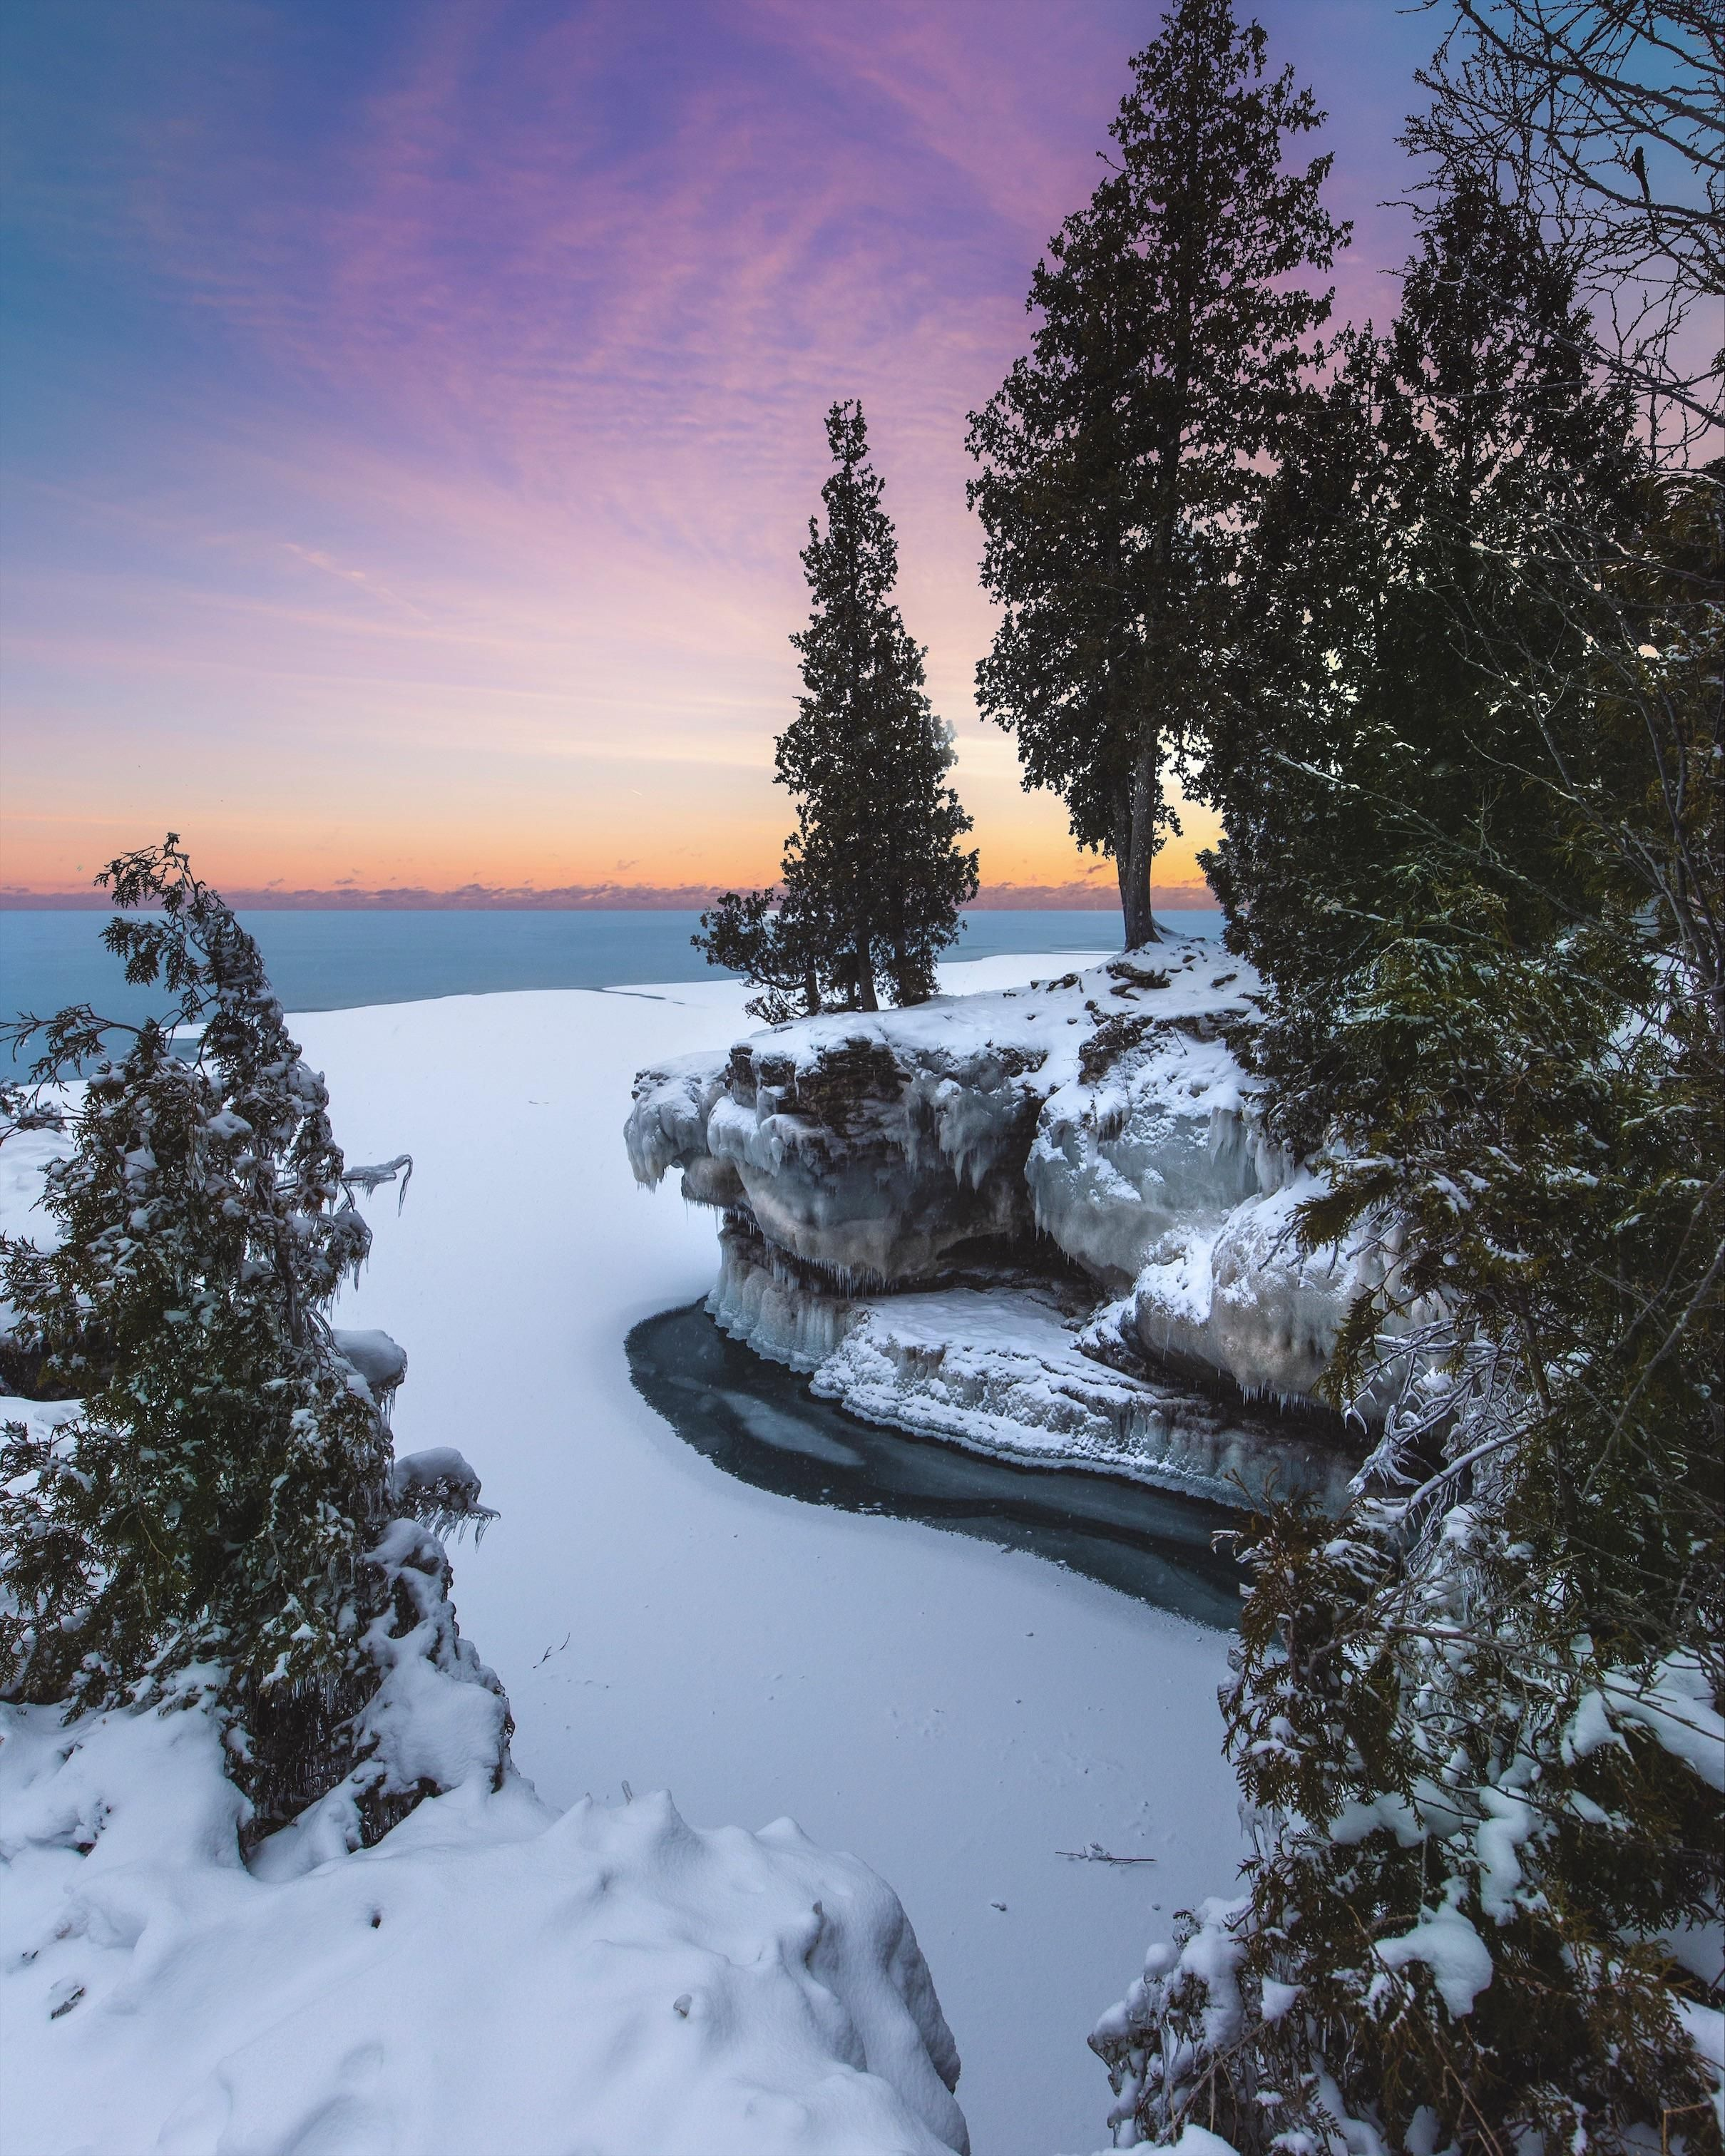 A Frozen Winter Sunrise On Lake Michigan Door County Wi 2419x3024 Oc Instagram Grantplace Winter Landscape Photography Winter Sunrise Lake Michigan